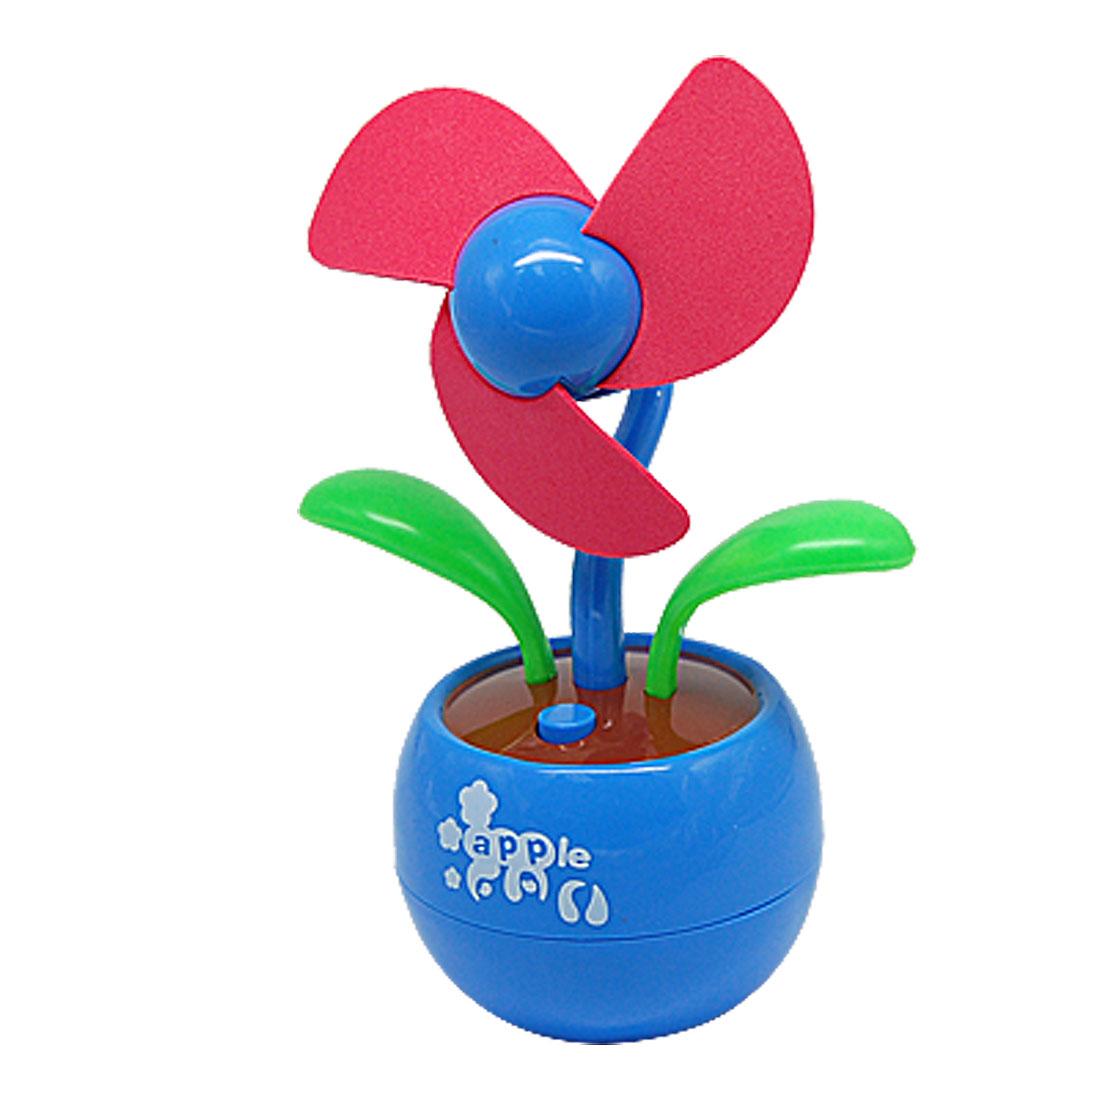 Flower Shaped Portable USB Fan for Laptop / PC